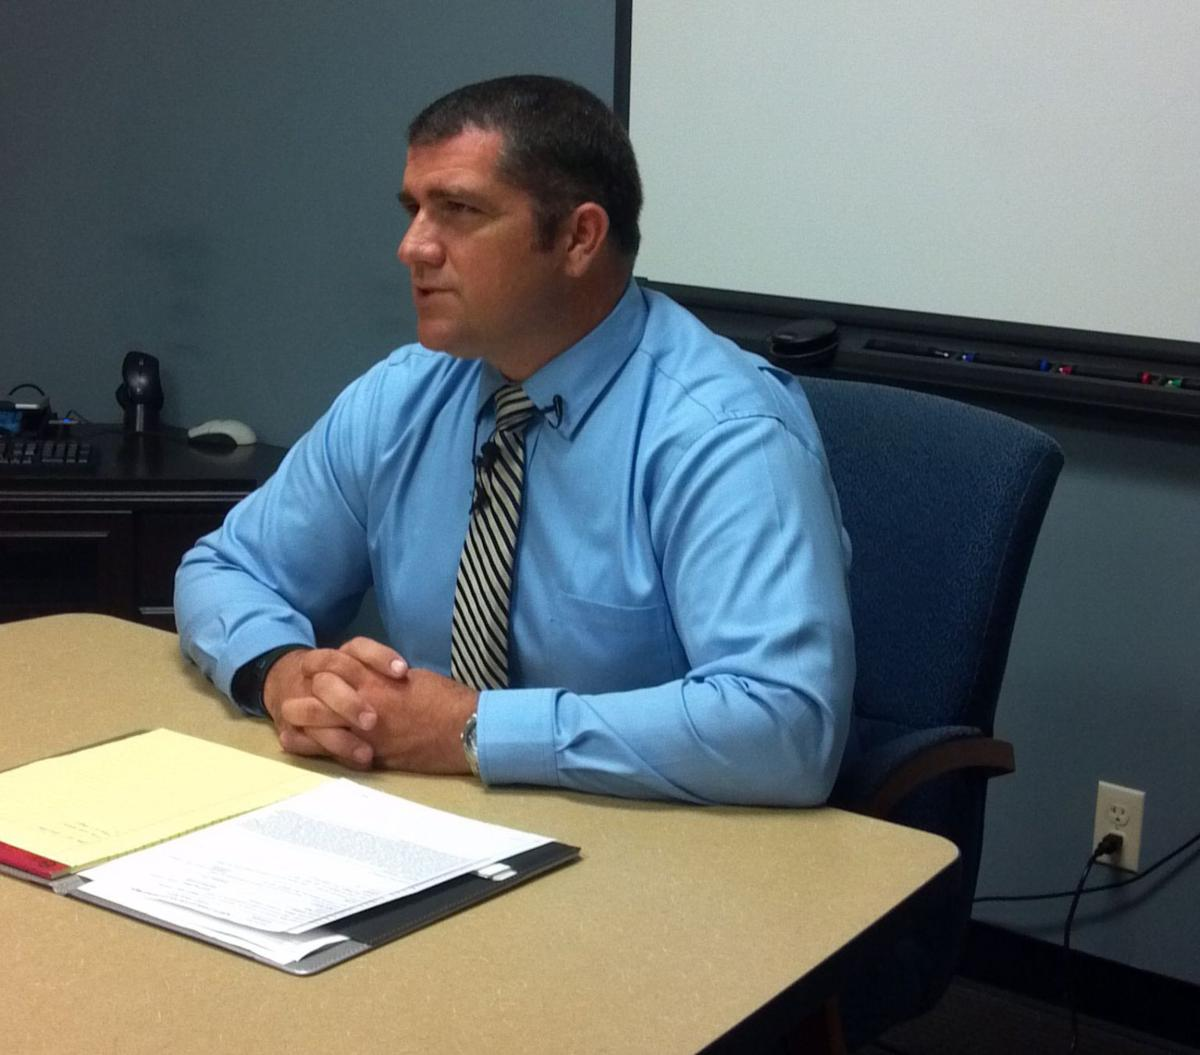 N. Chas. police ask for help finding Renken's watch taken during fatal liquor store shooting